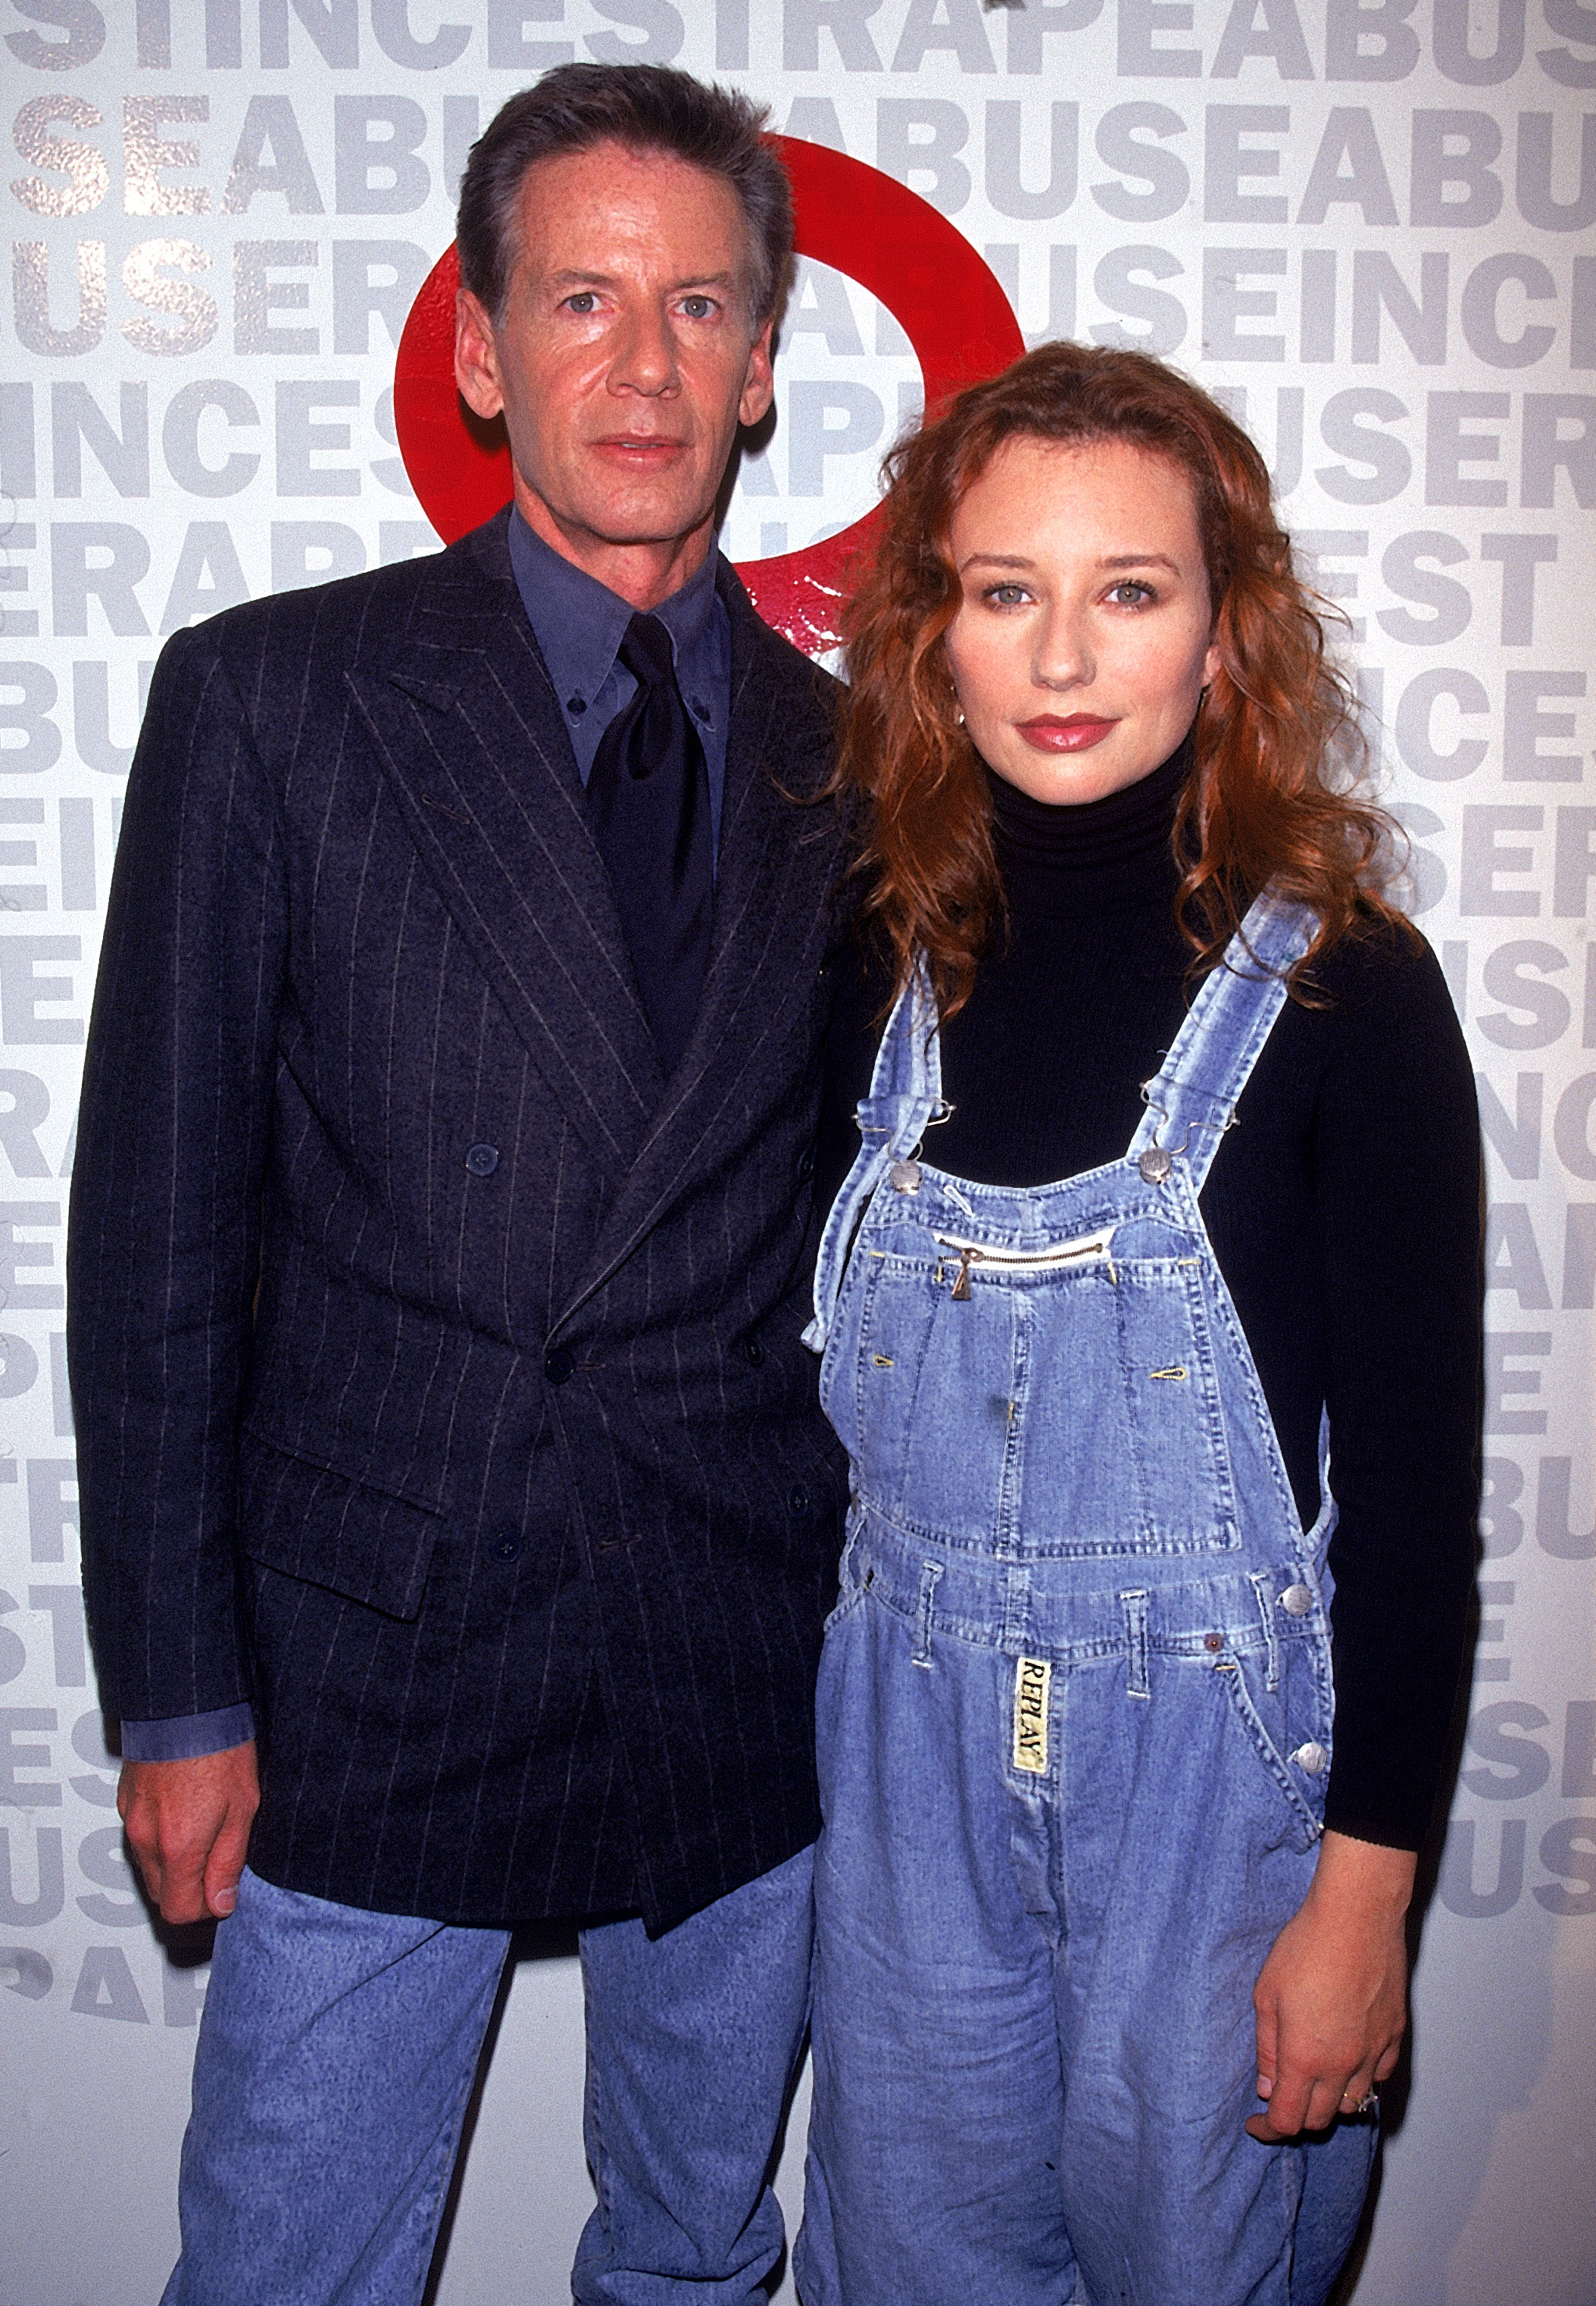 Grunge fashion 1990s men 1990s grunge fashion related keywords - Grunge Fashion 1990s Men 1990s Grunge Fashion Related Keywords 21